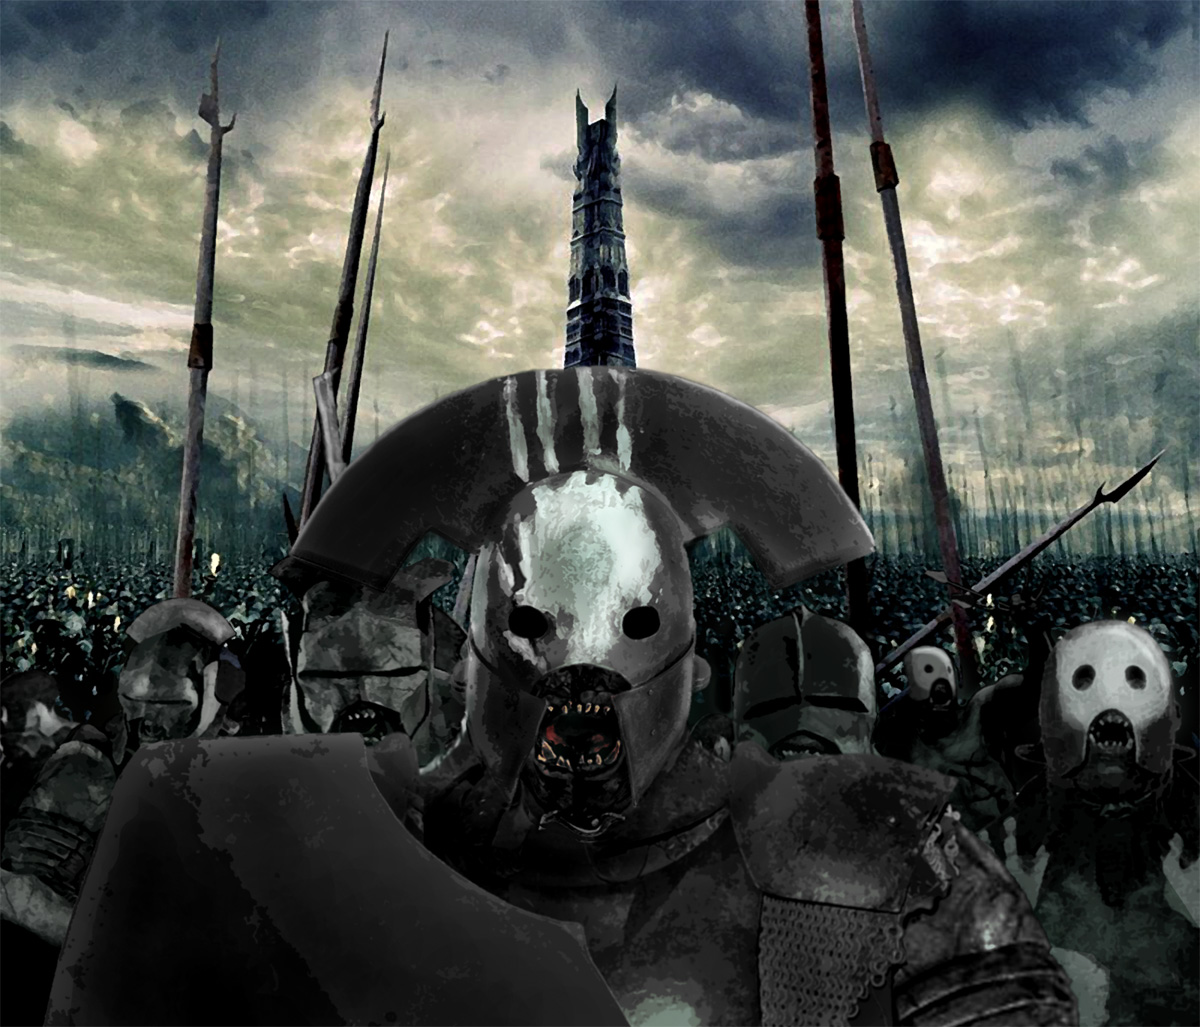 The Orcs Black_Orcs__Uruk_Hai_by_Skinny22